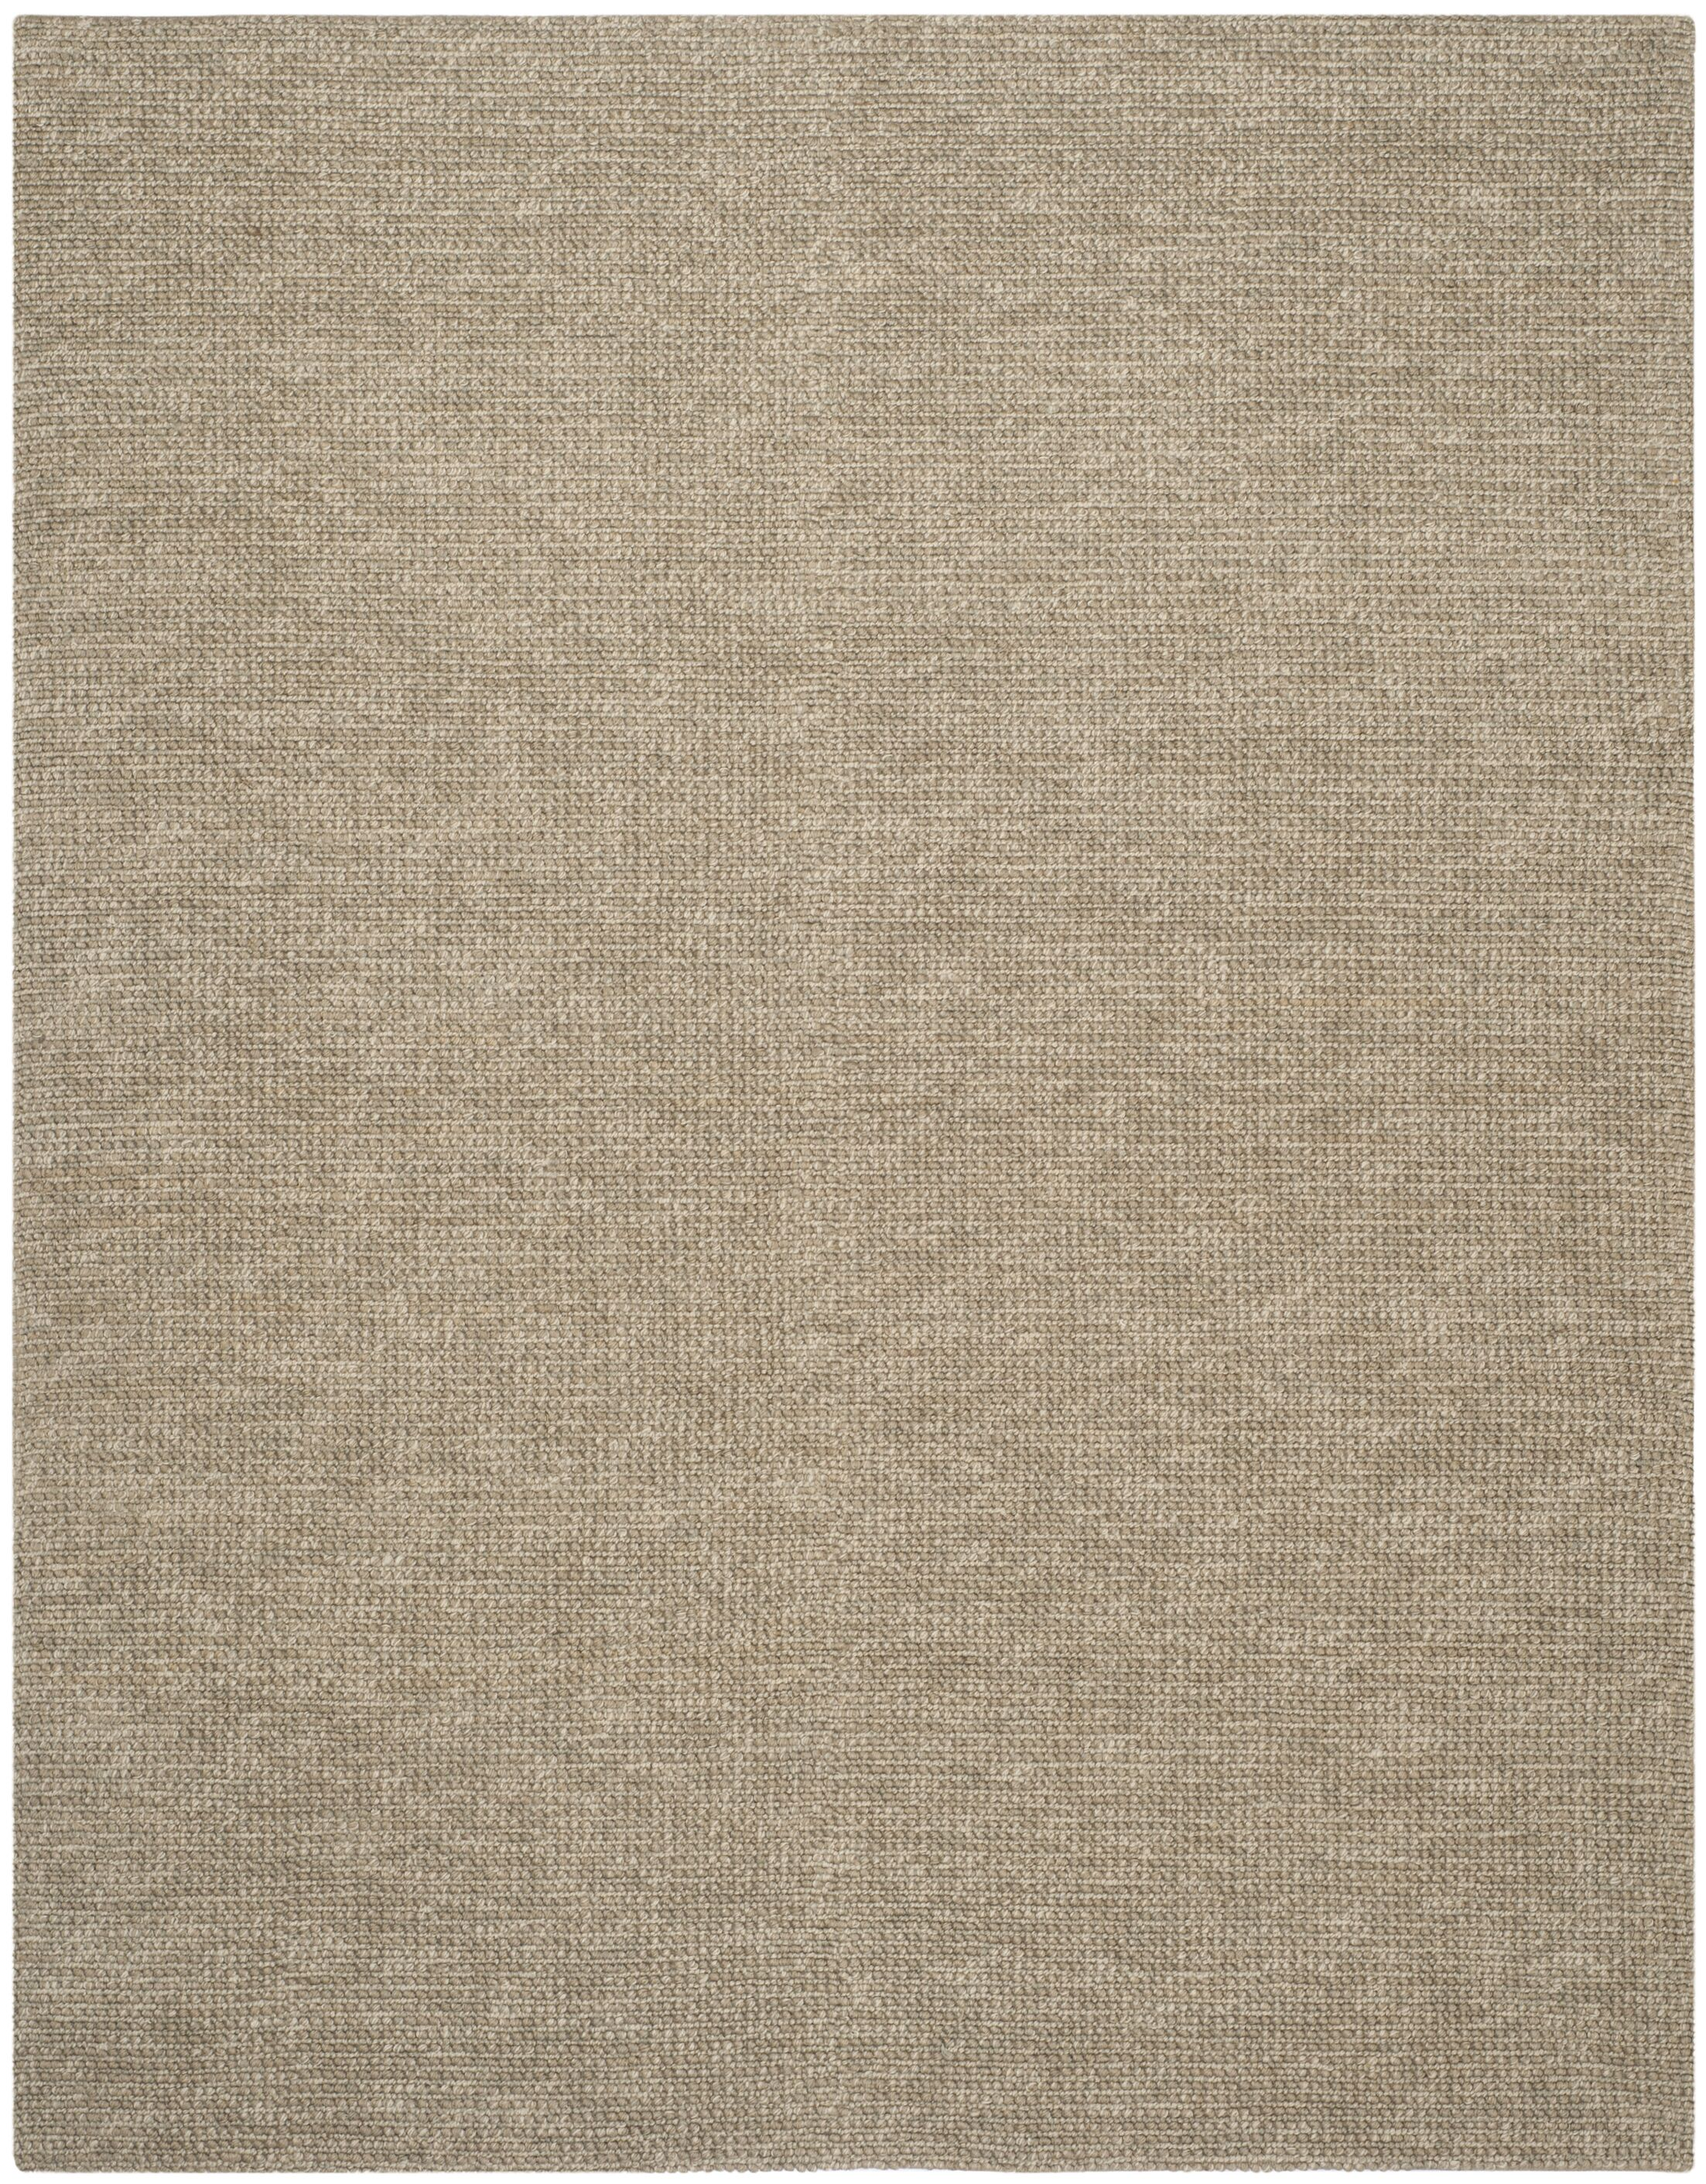 Nubby Tweed Hand woven Brown Area Rug Rug Size: Rectangle 8' x 10'